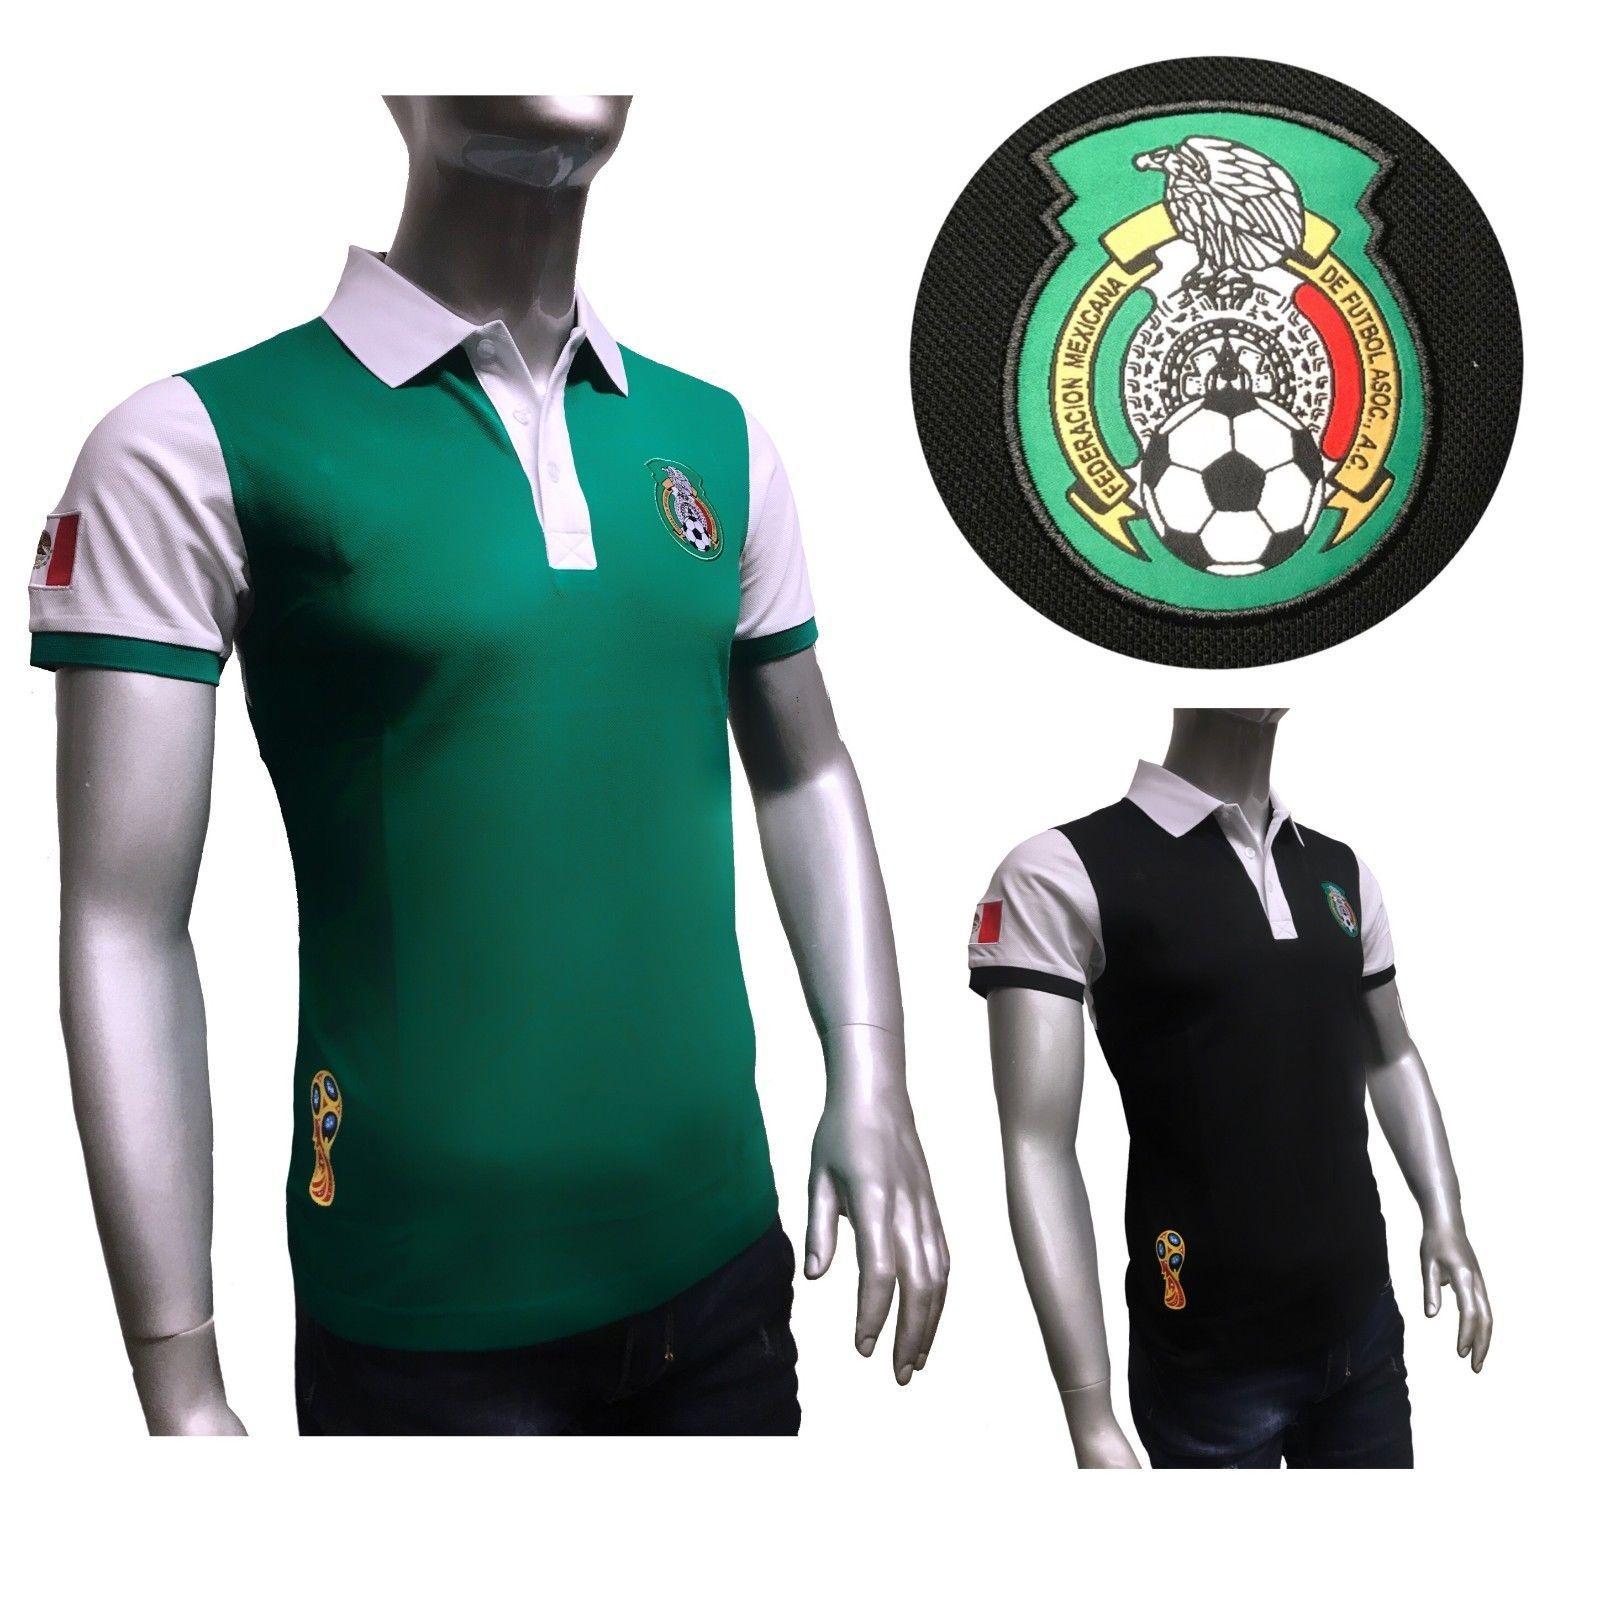 Mexico 2018 World Cup Russia Soccer Jersey Green Mundial Rusia 2018 Polo  Shirts Discount Price 25.90 e762de66b